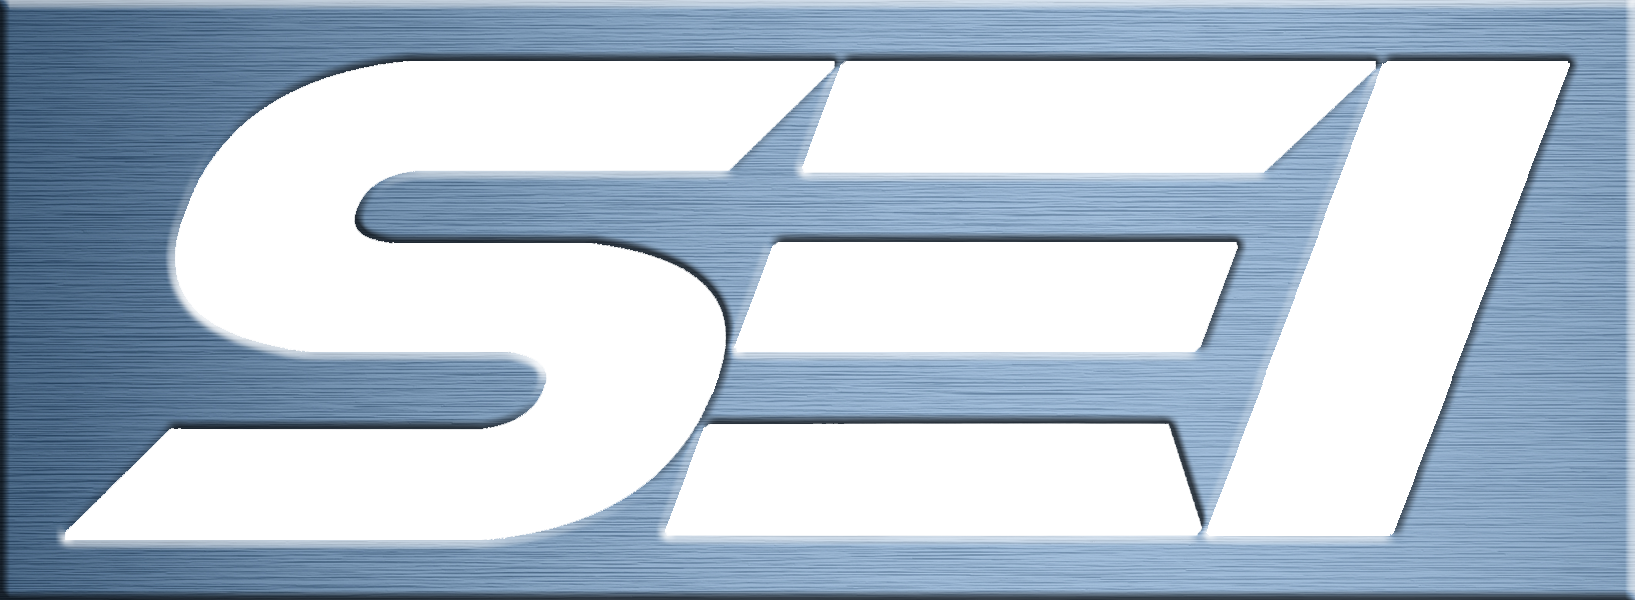 SEI_logo_61_trans_1_metal_emboss_blue